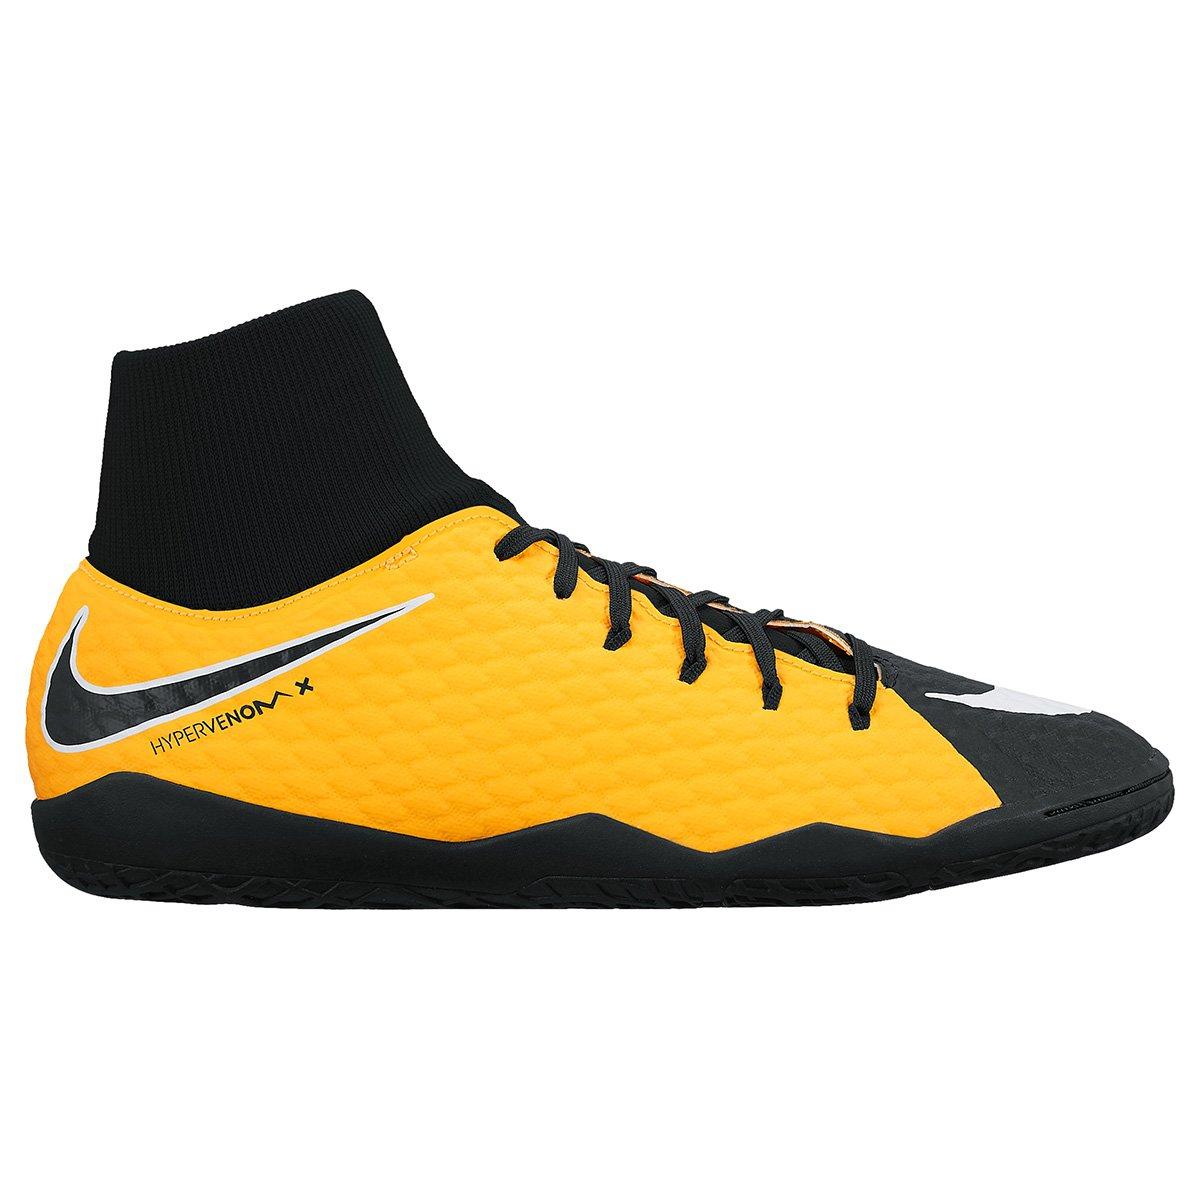 2c588ee4a088 Chuteira Futsal Nike Hypervenom Phelon 3 DF IC - Compre Agora